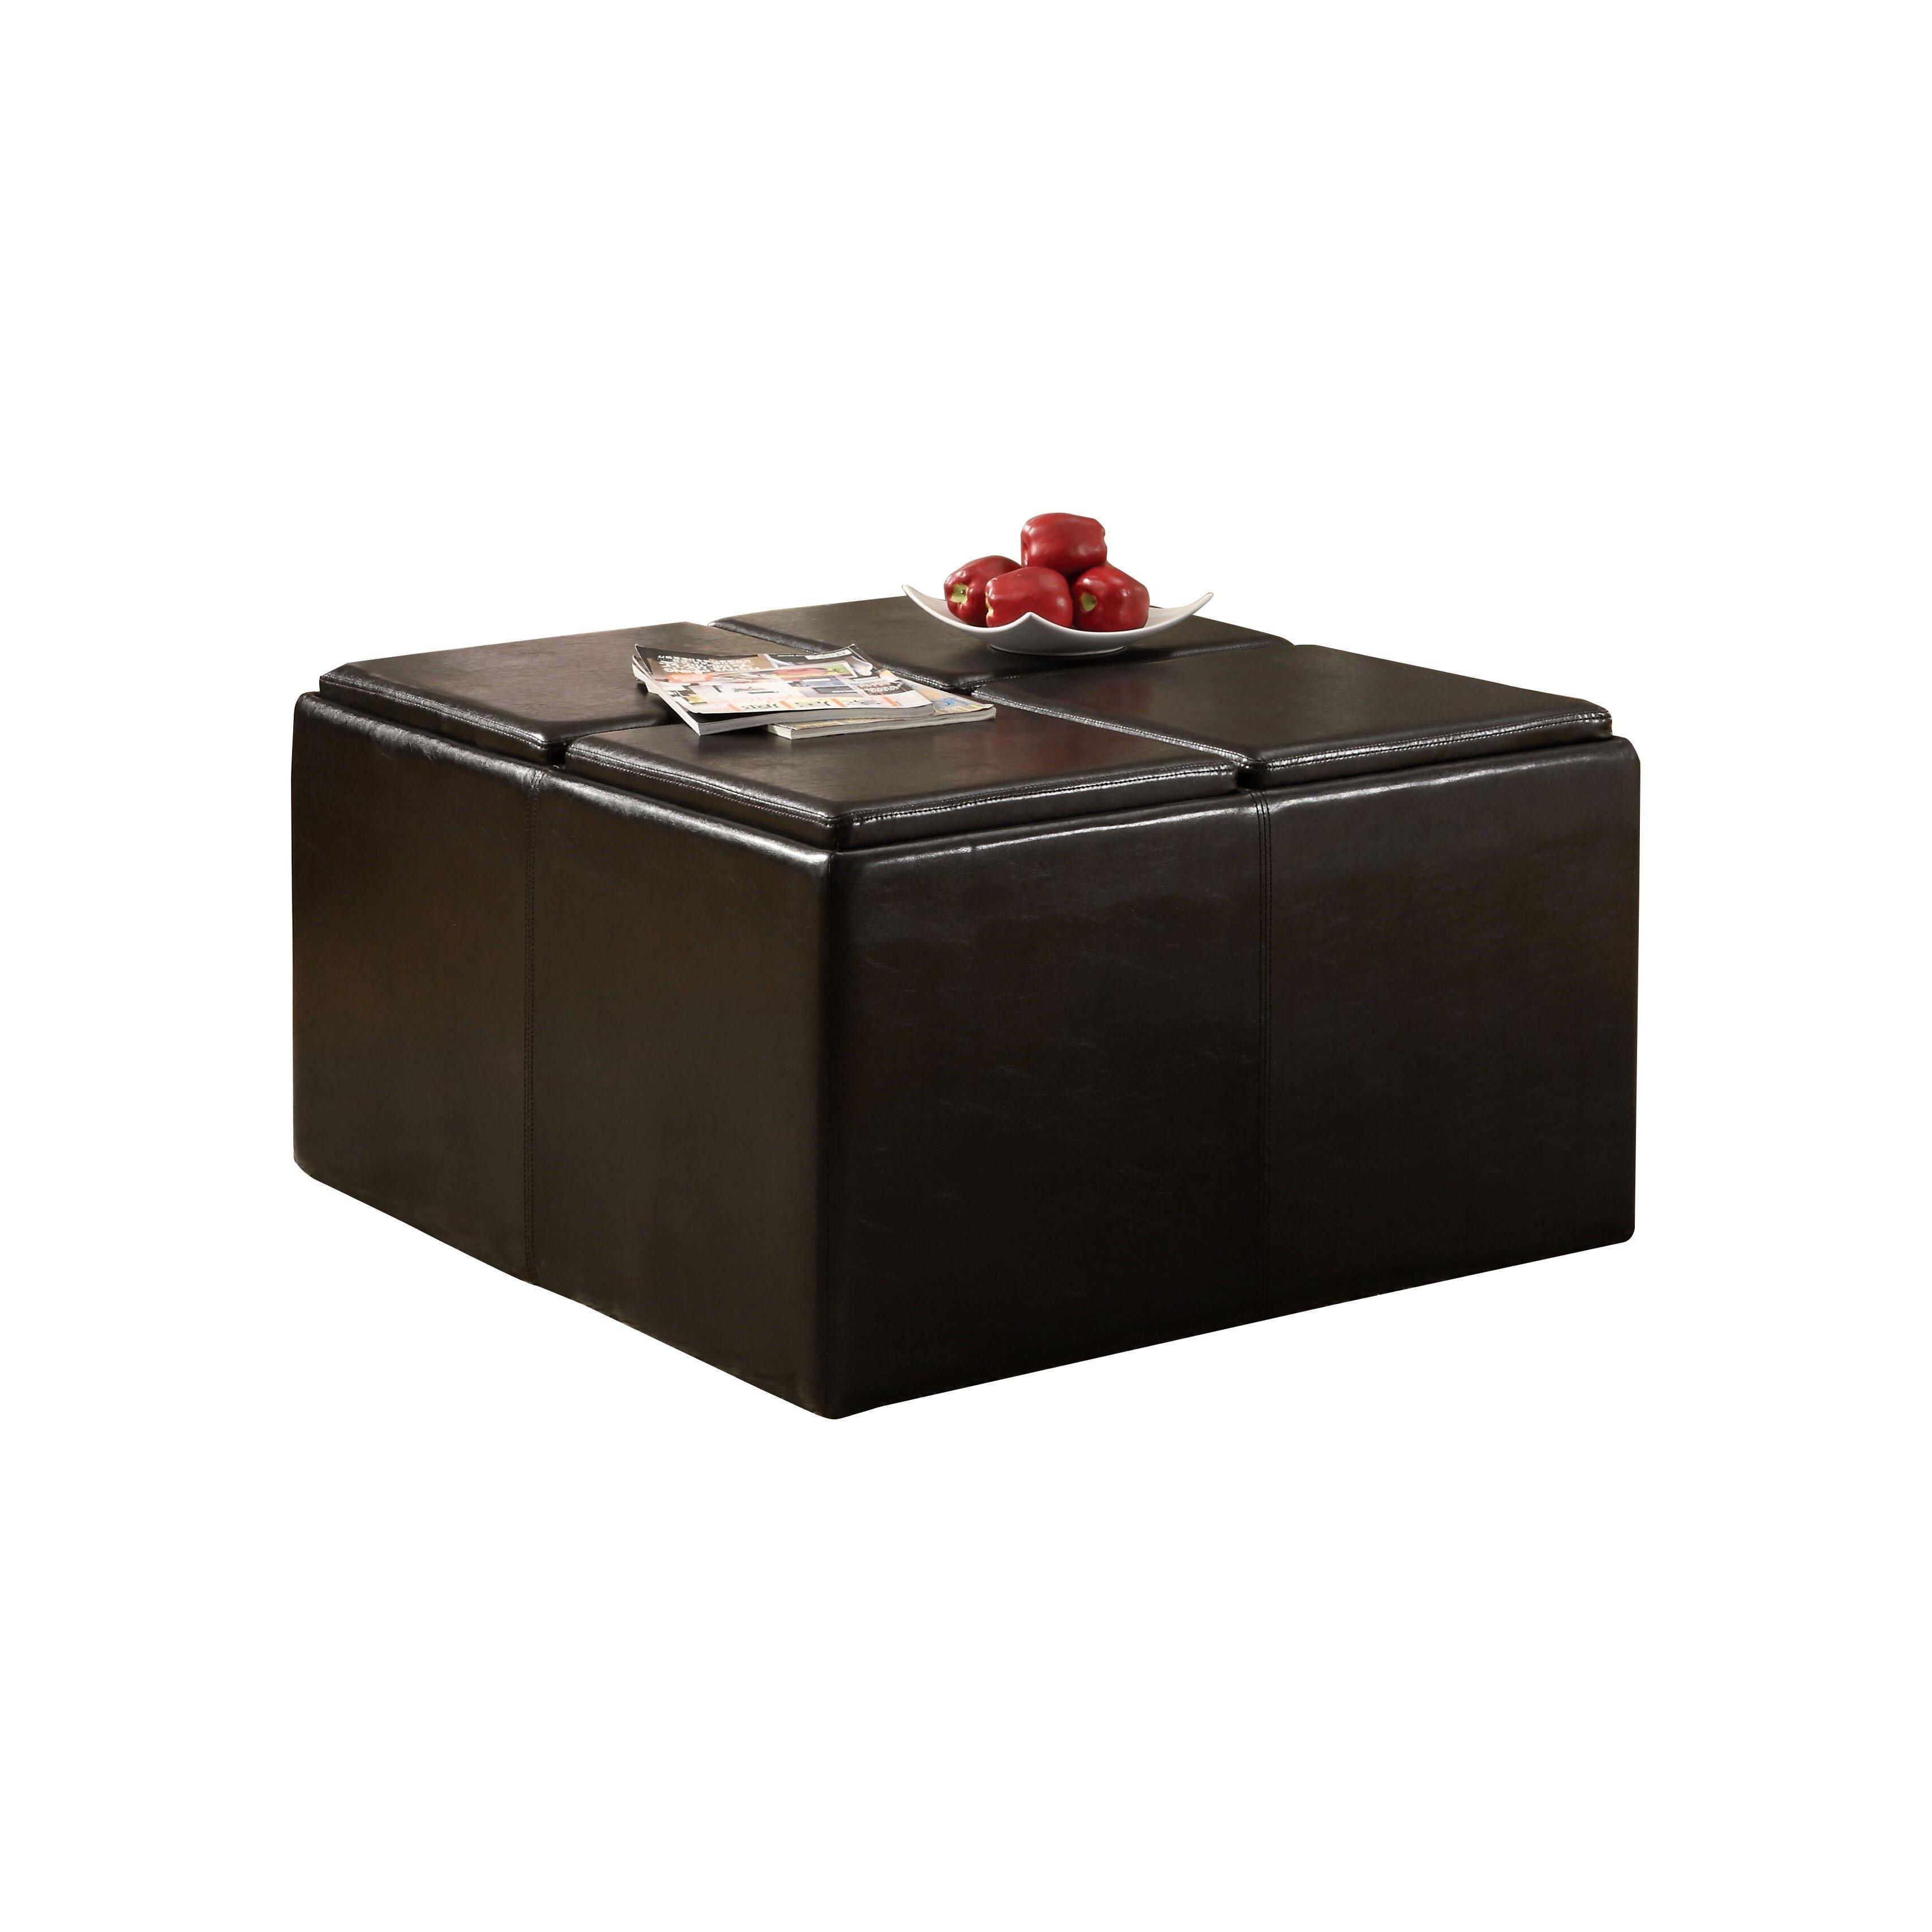 Hokku Designs 5 Piece Verano Coffee Table Ottoman Set Reviews Wayfair